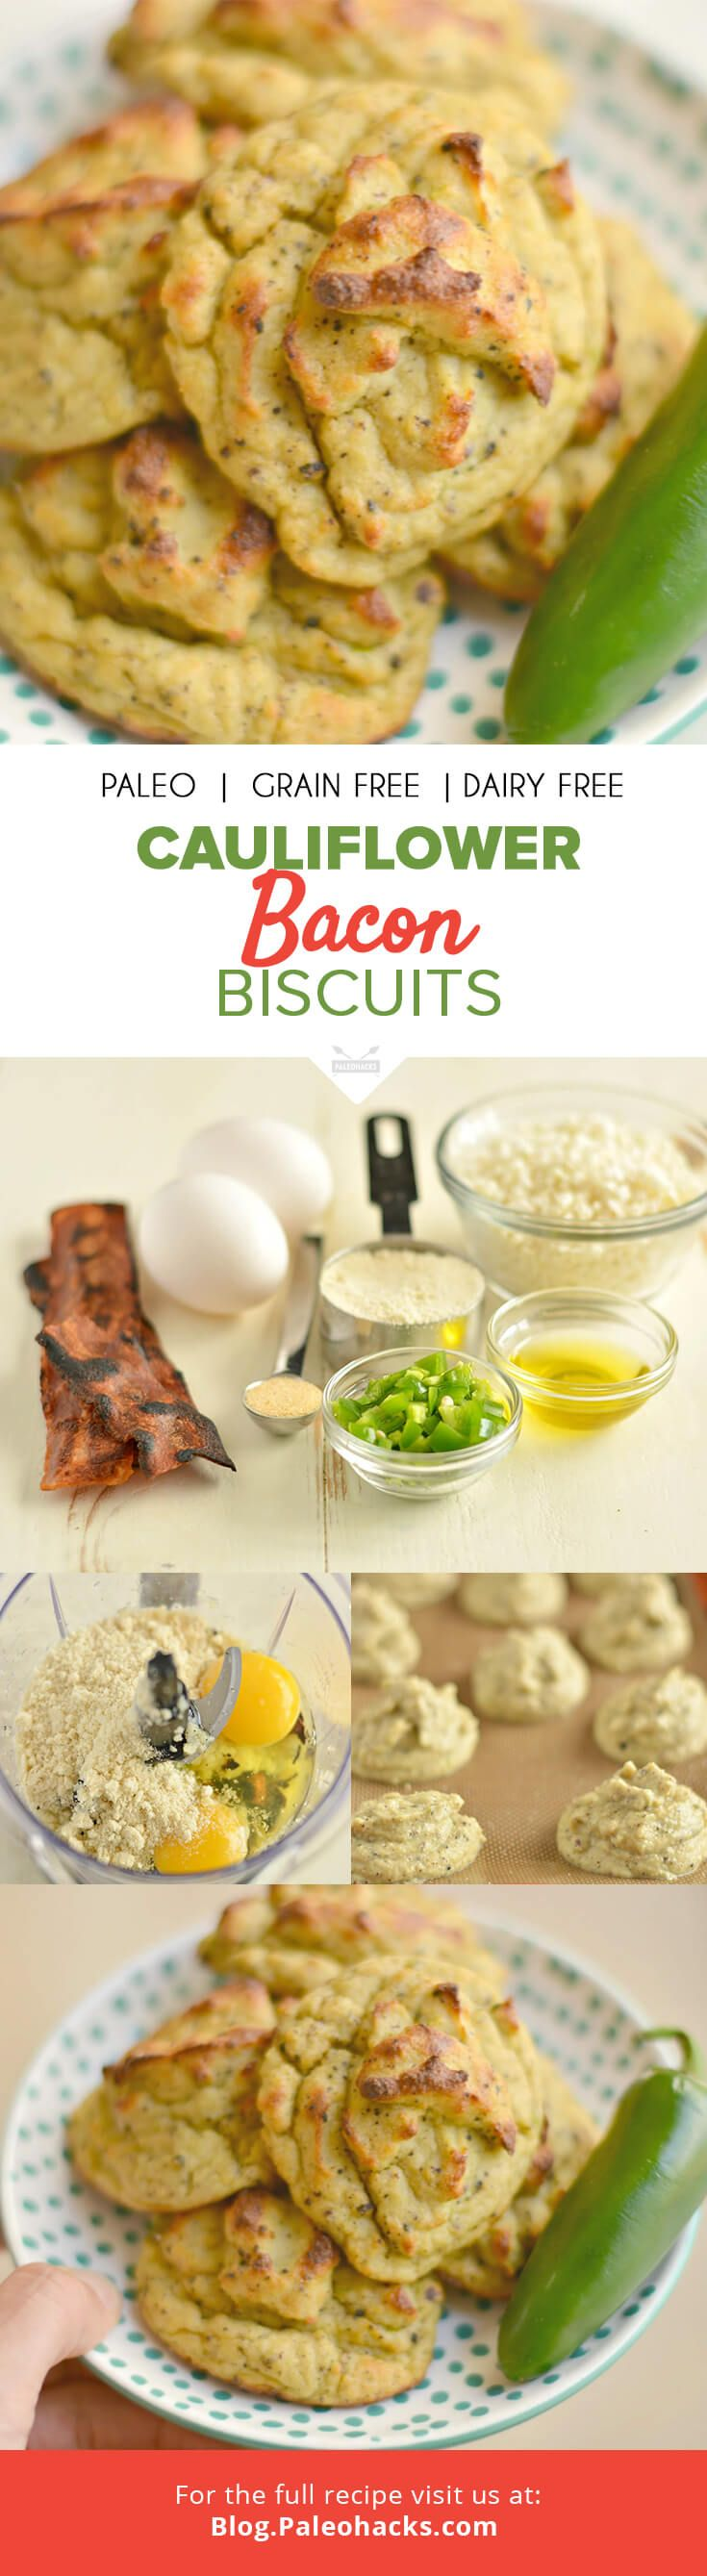 75 best bake sale recipes ideas images on pinterest bake sale